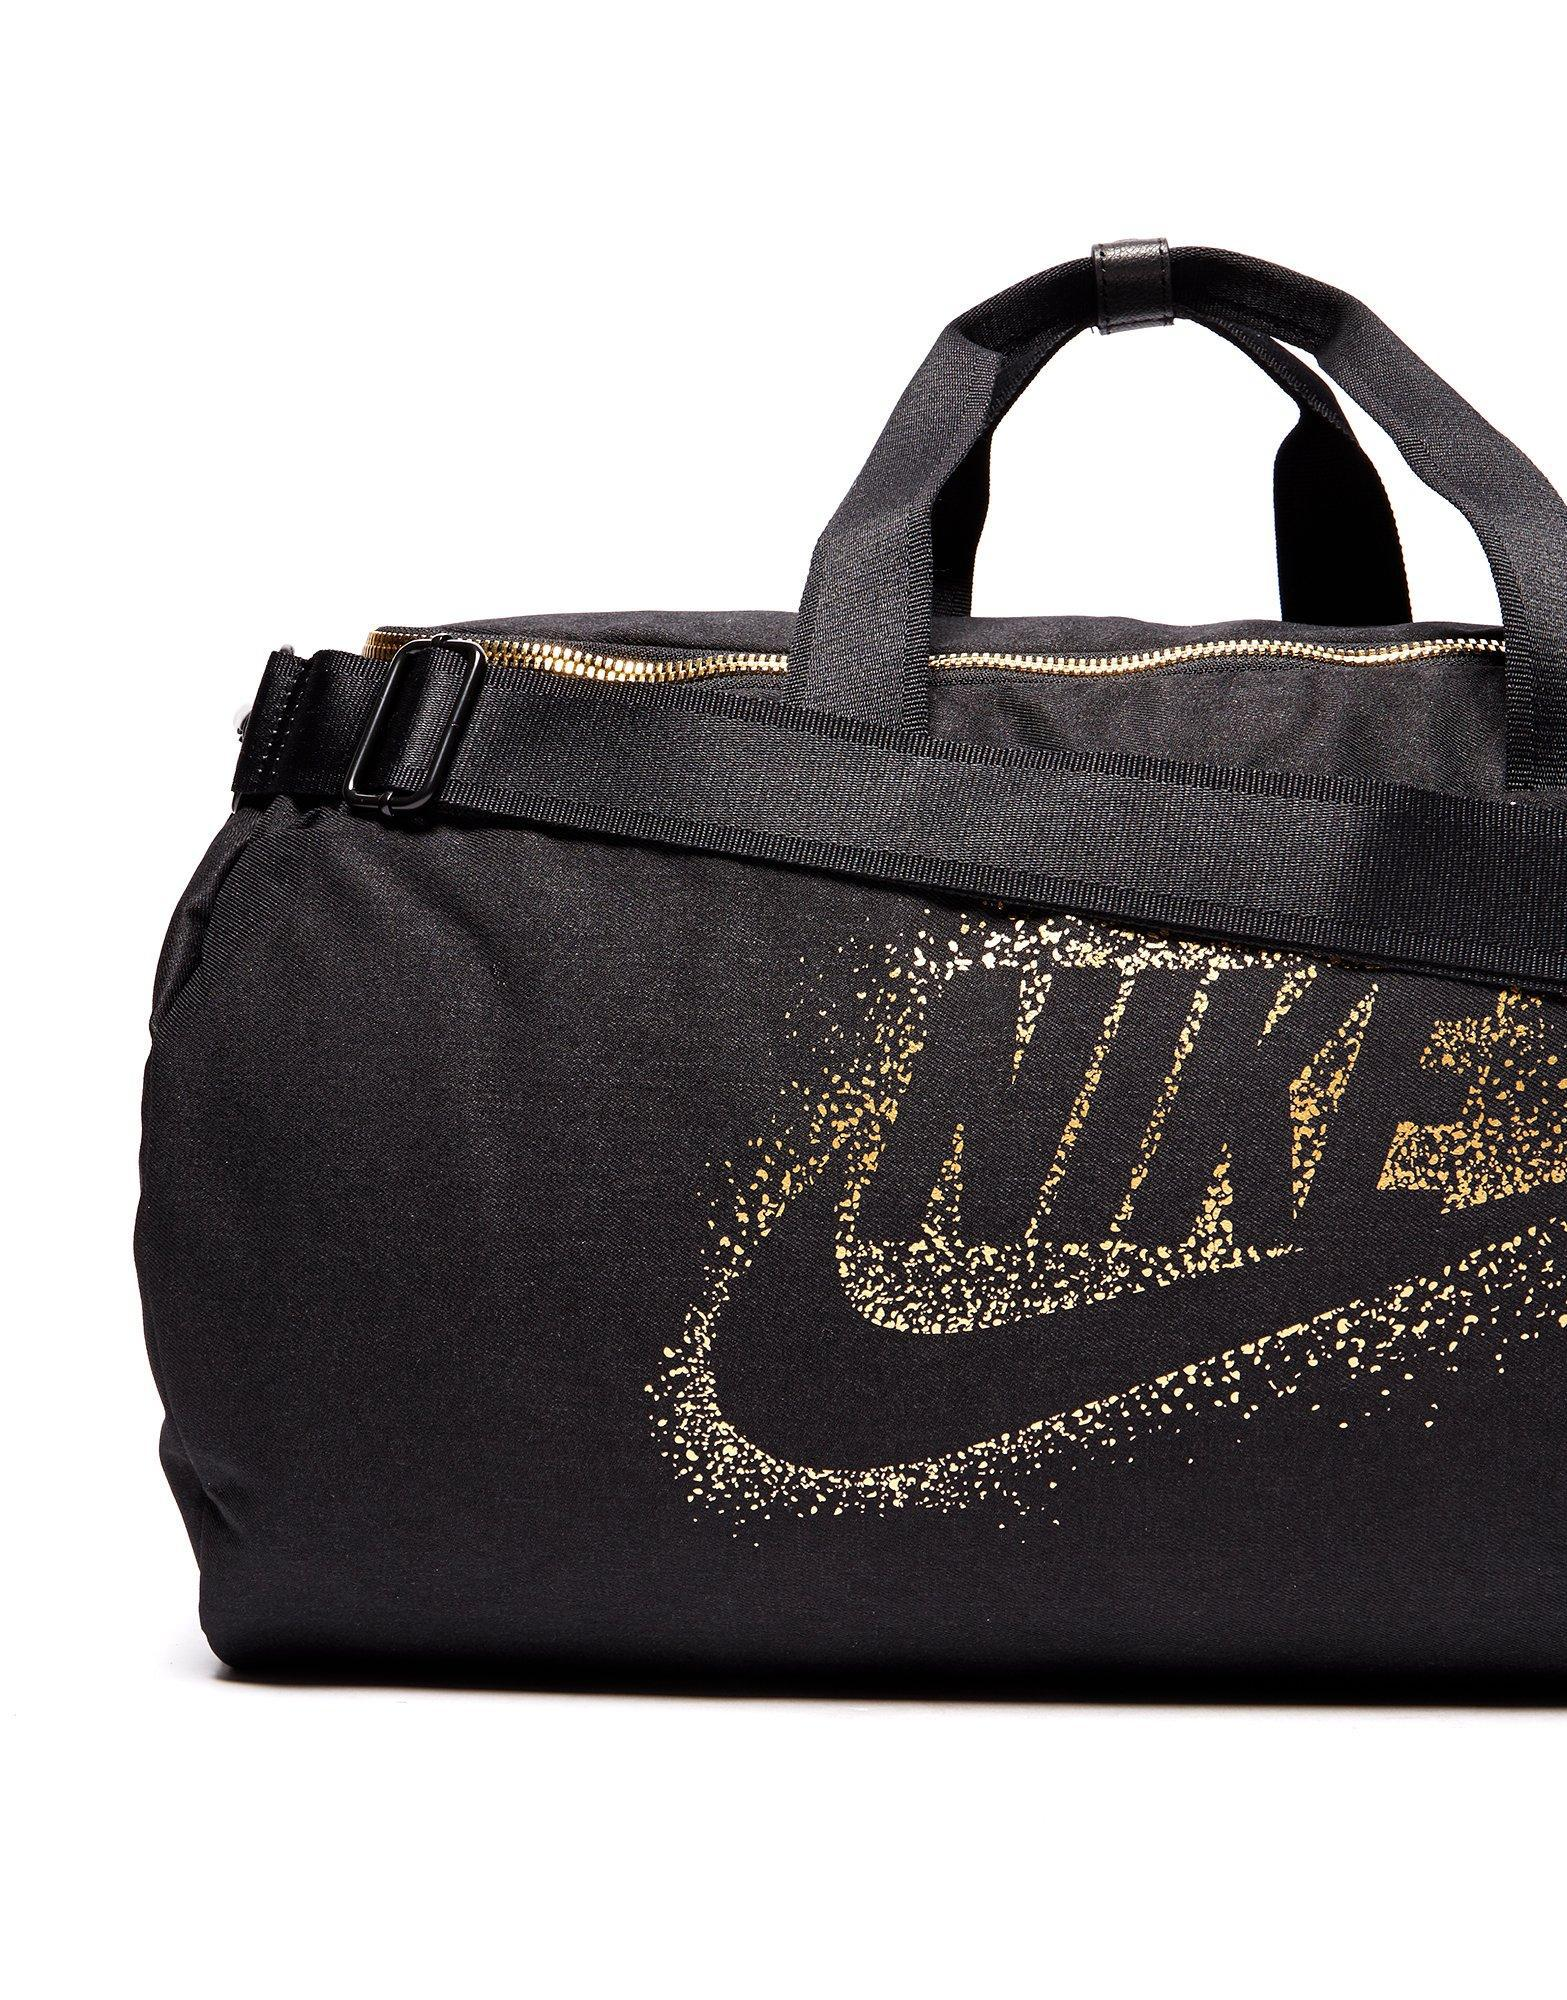 Lyst - Nike Met Duffle Bag in Black for Men d0865088d1f22